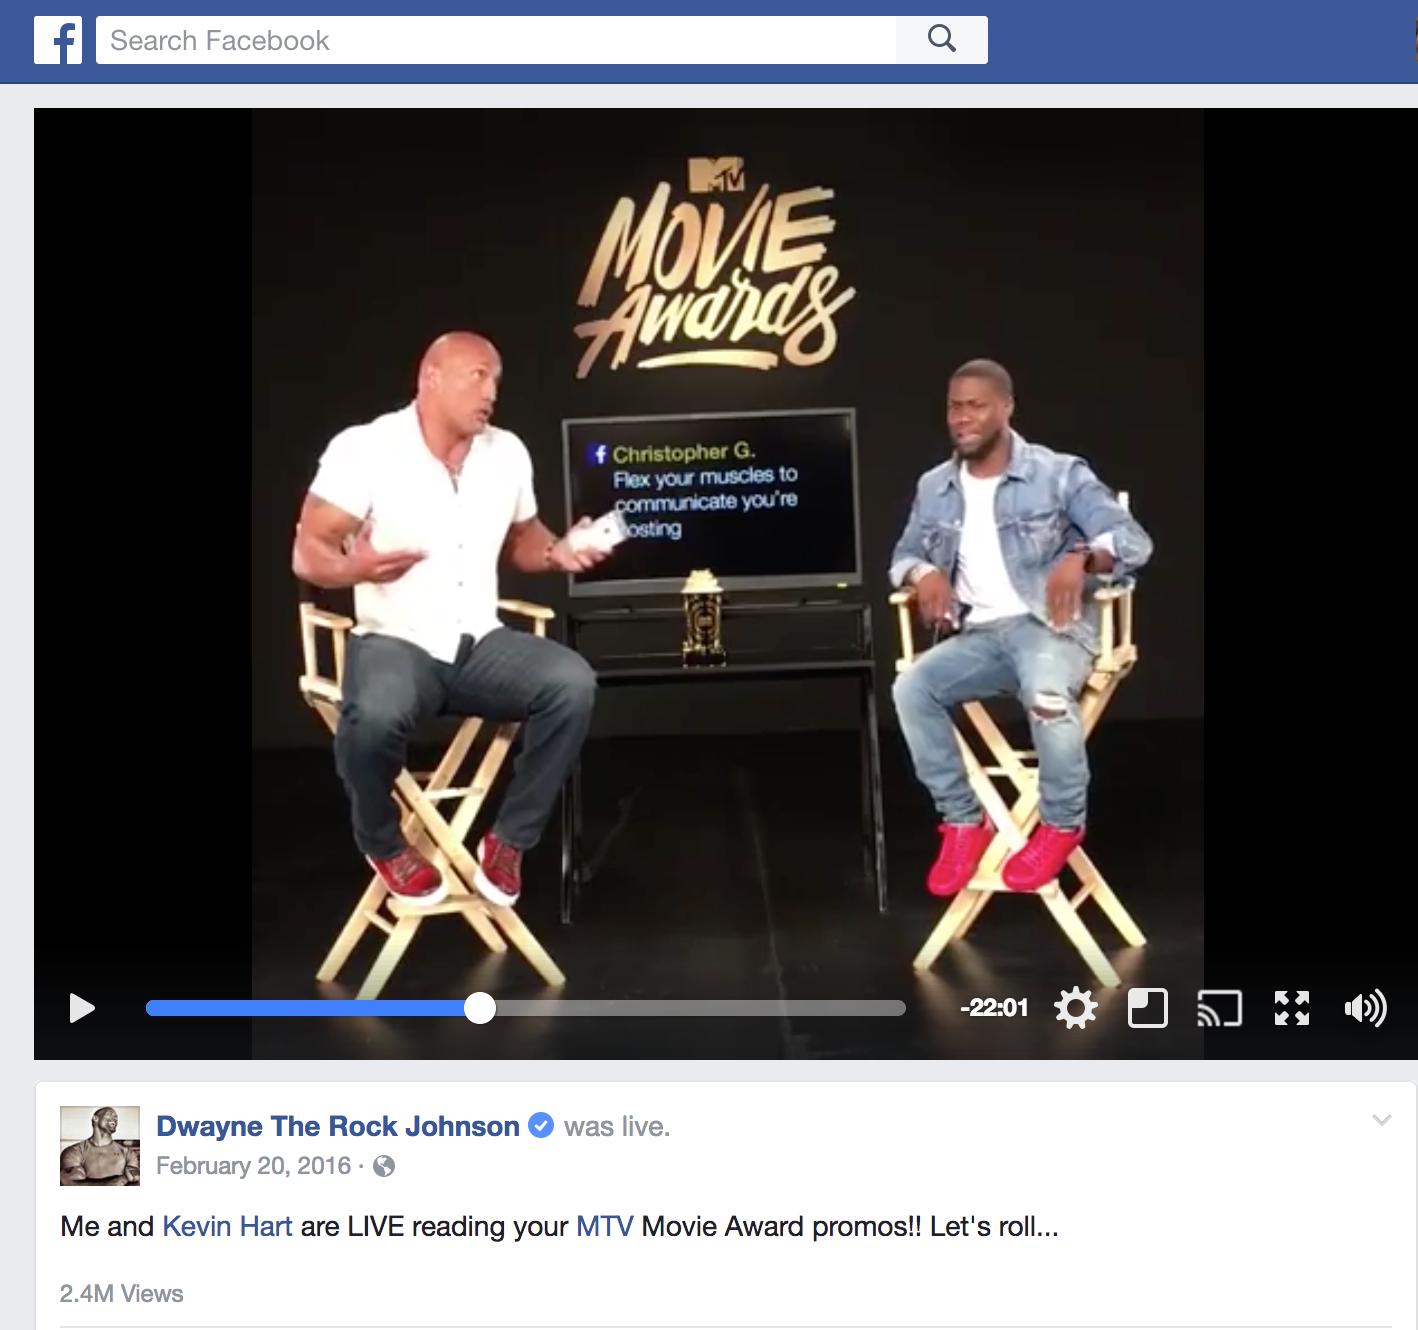 - Watch the livestream on FB